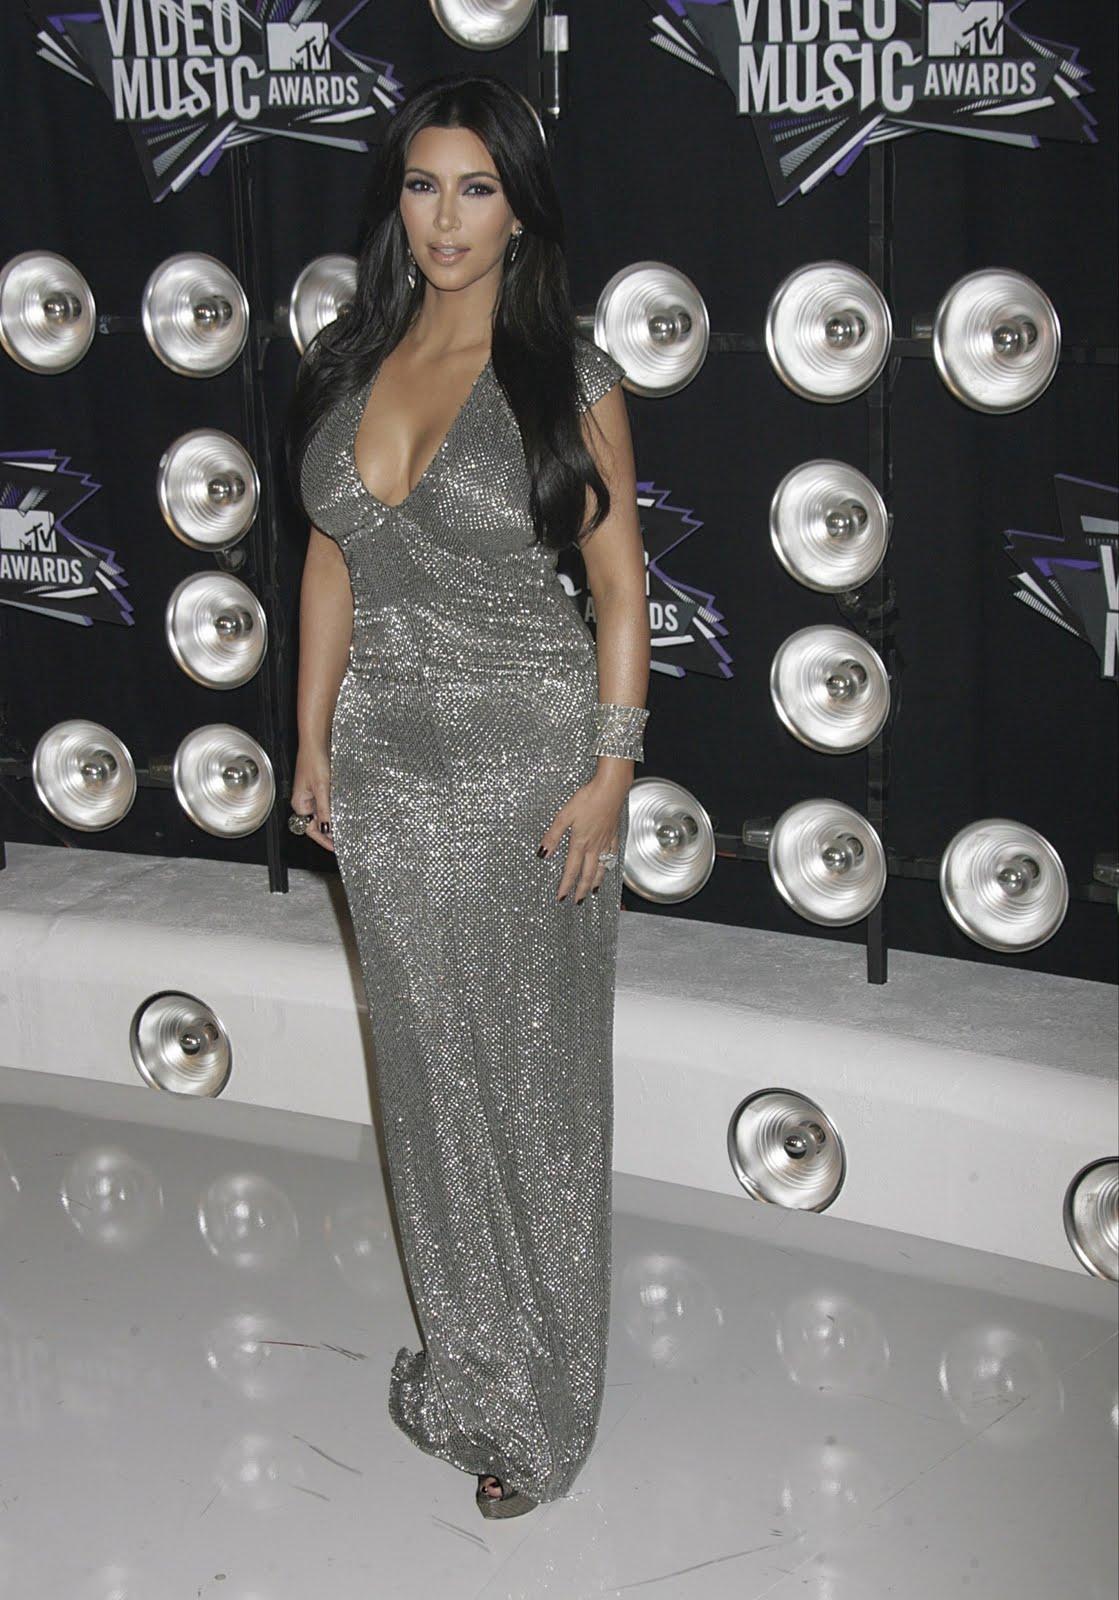 http://4.bp.blogspot.com/-Rc4bEKRGTrE/TqP3JyuPbAI/AAAAAAAAFRI/uu2ZpPPN7qA/s1600/Kim-Kardashian-125.jpg